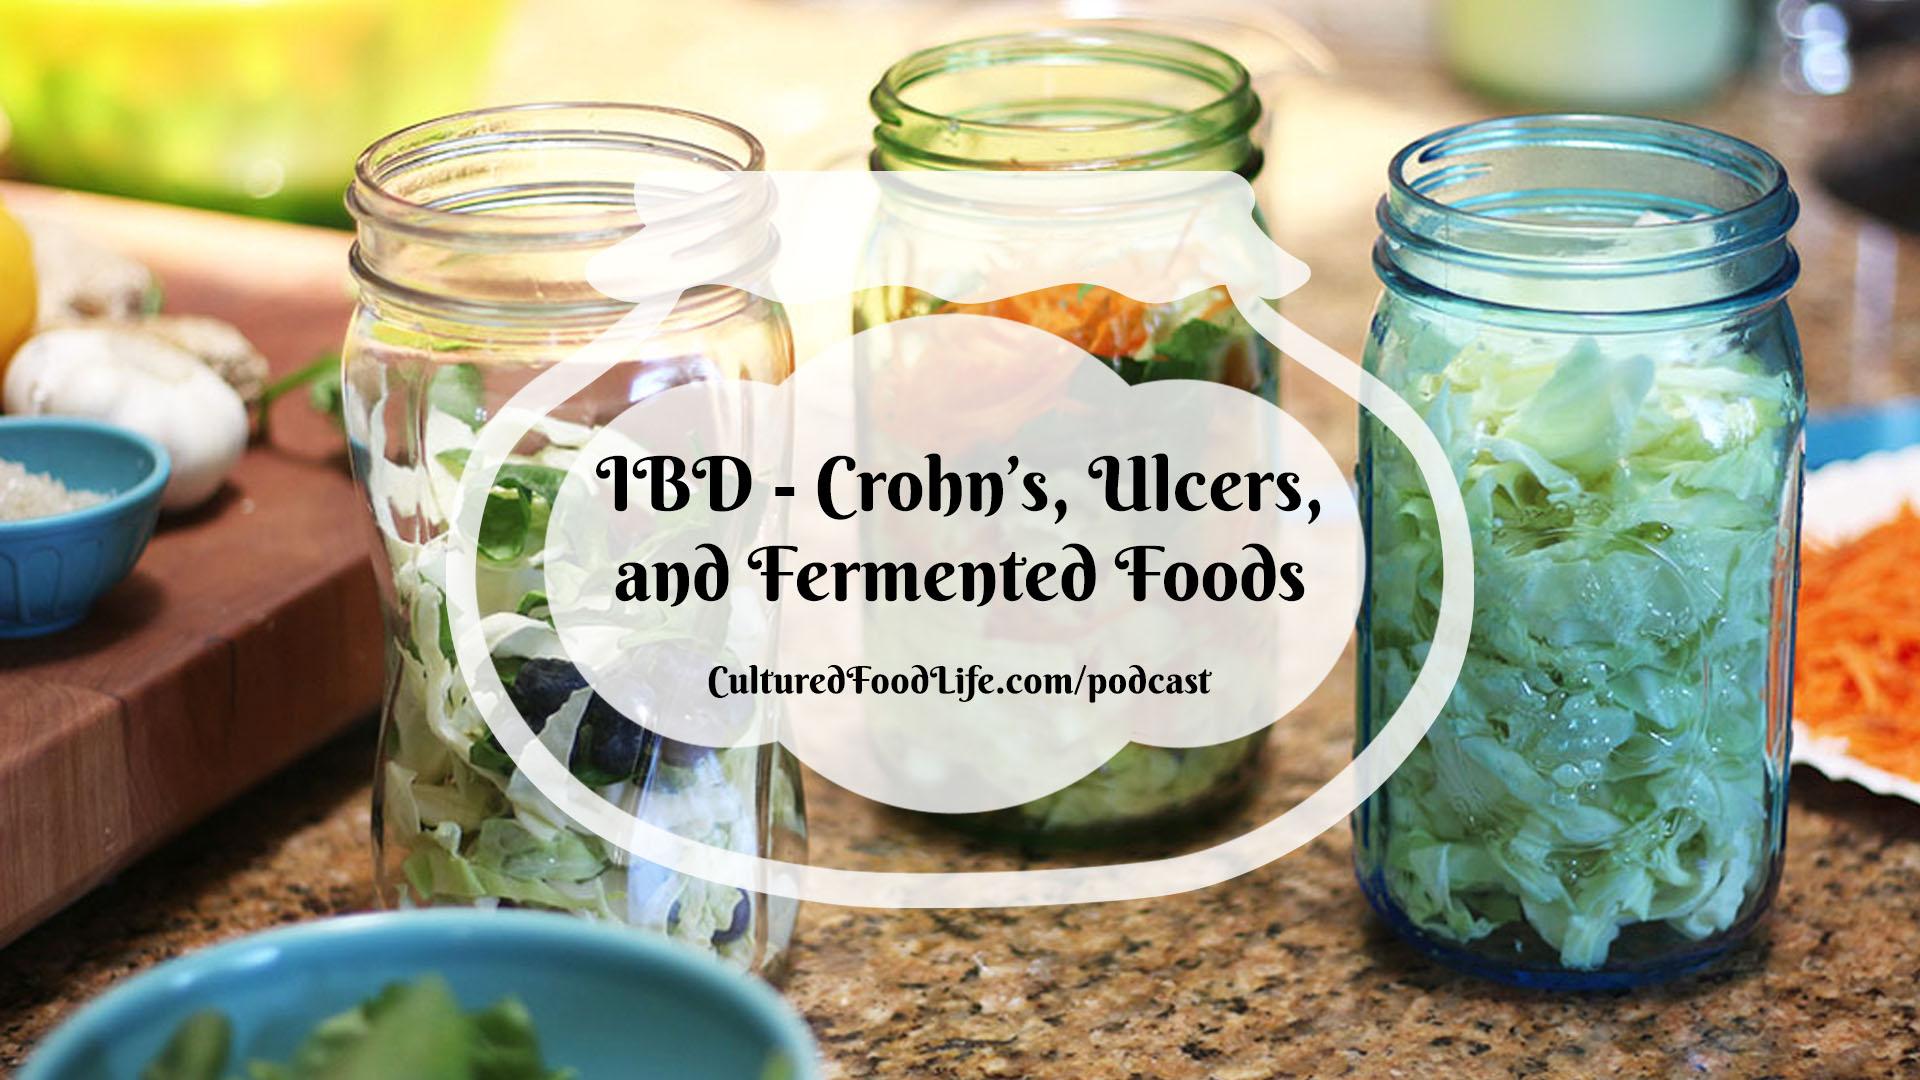 IBD - Crohn's, Ulcers, and Fermented Foods